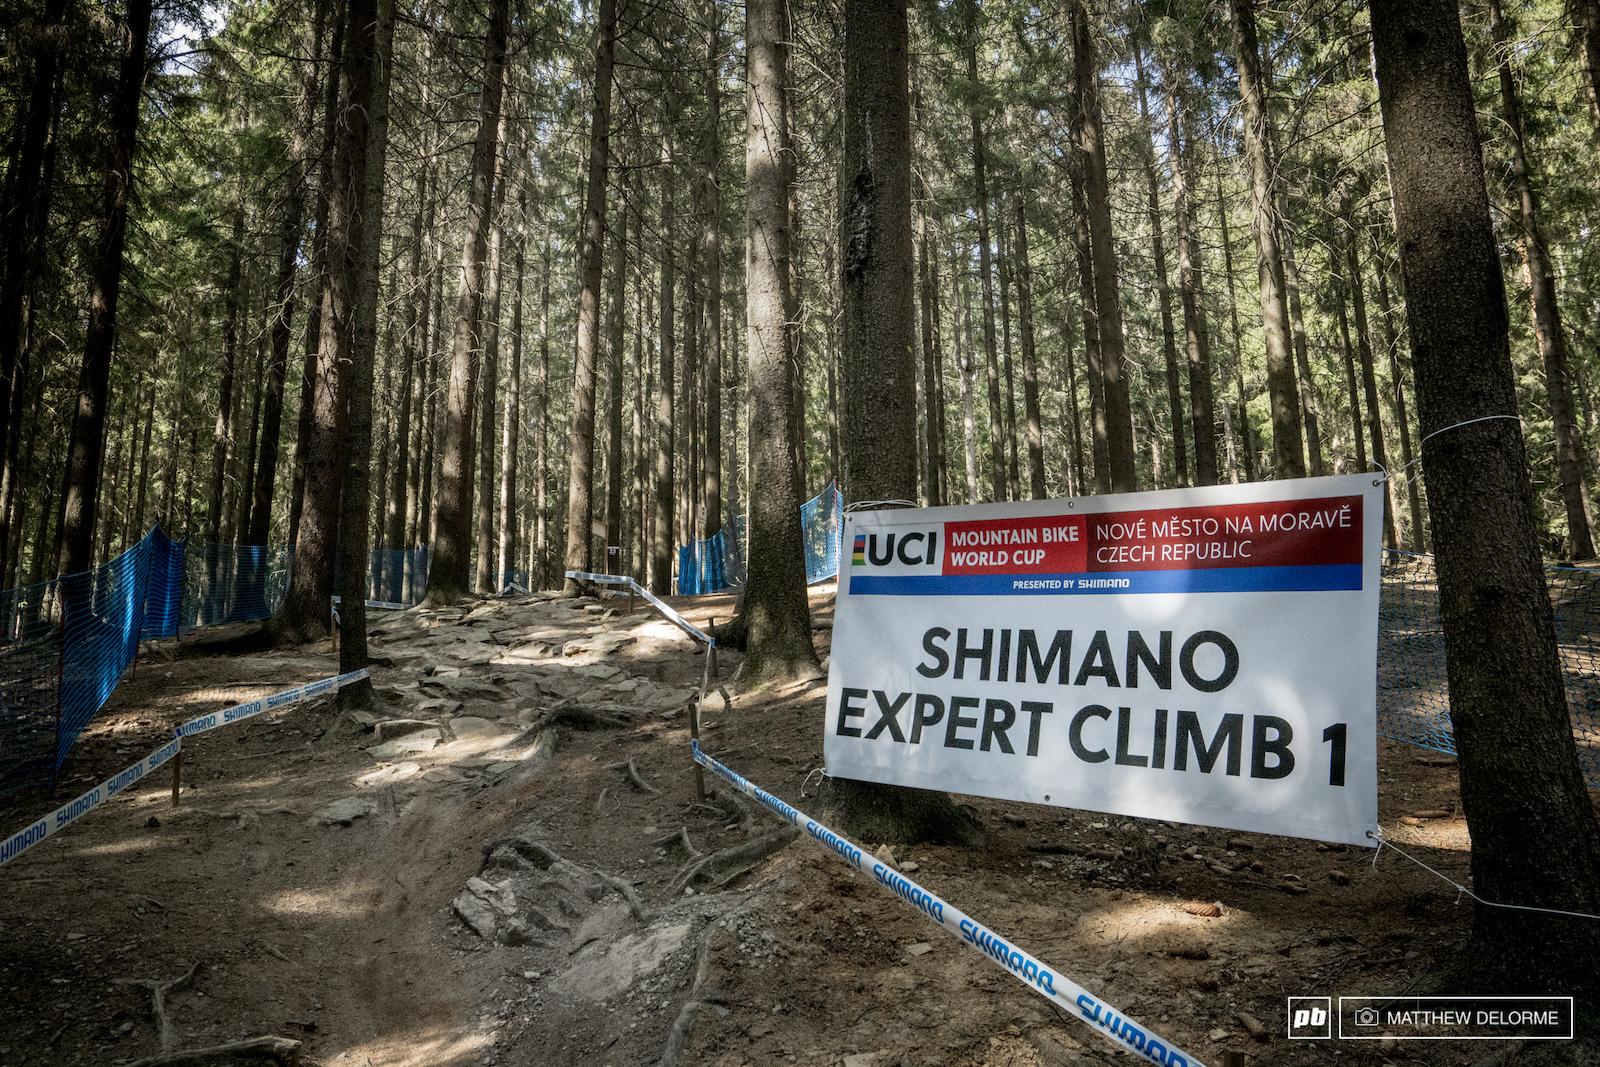 Shimano Expert Climb 1. Punchy and rocky.